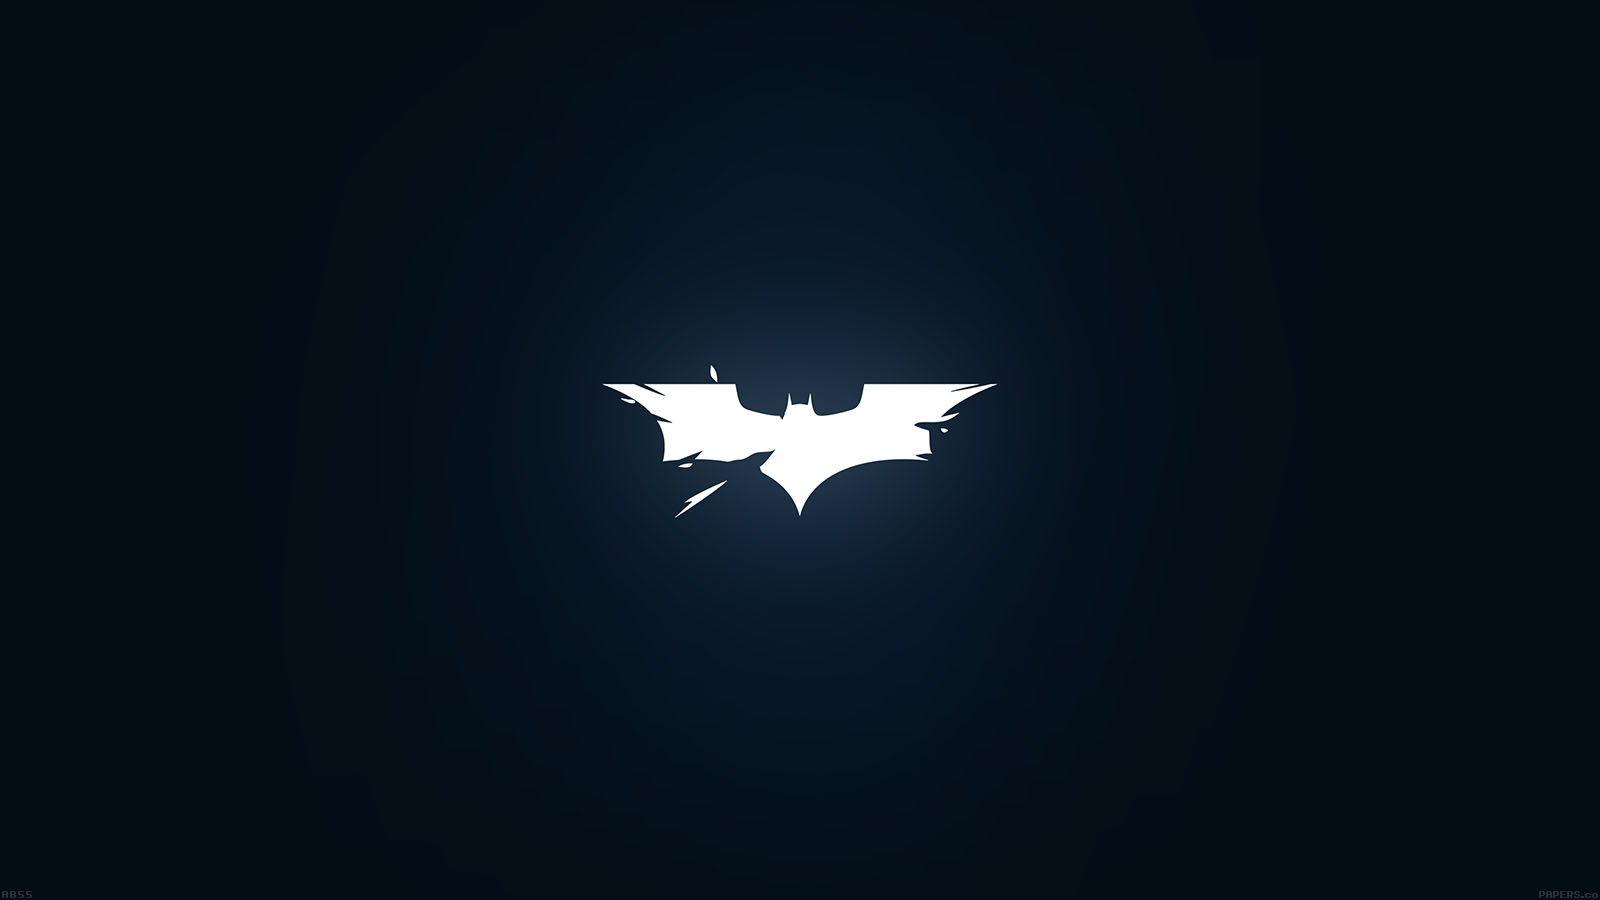 Shattered Iphone X Wallpaper Wallpaper For Desktop Laptop Ab55 Wallpaper Batman Logo